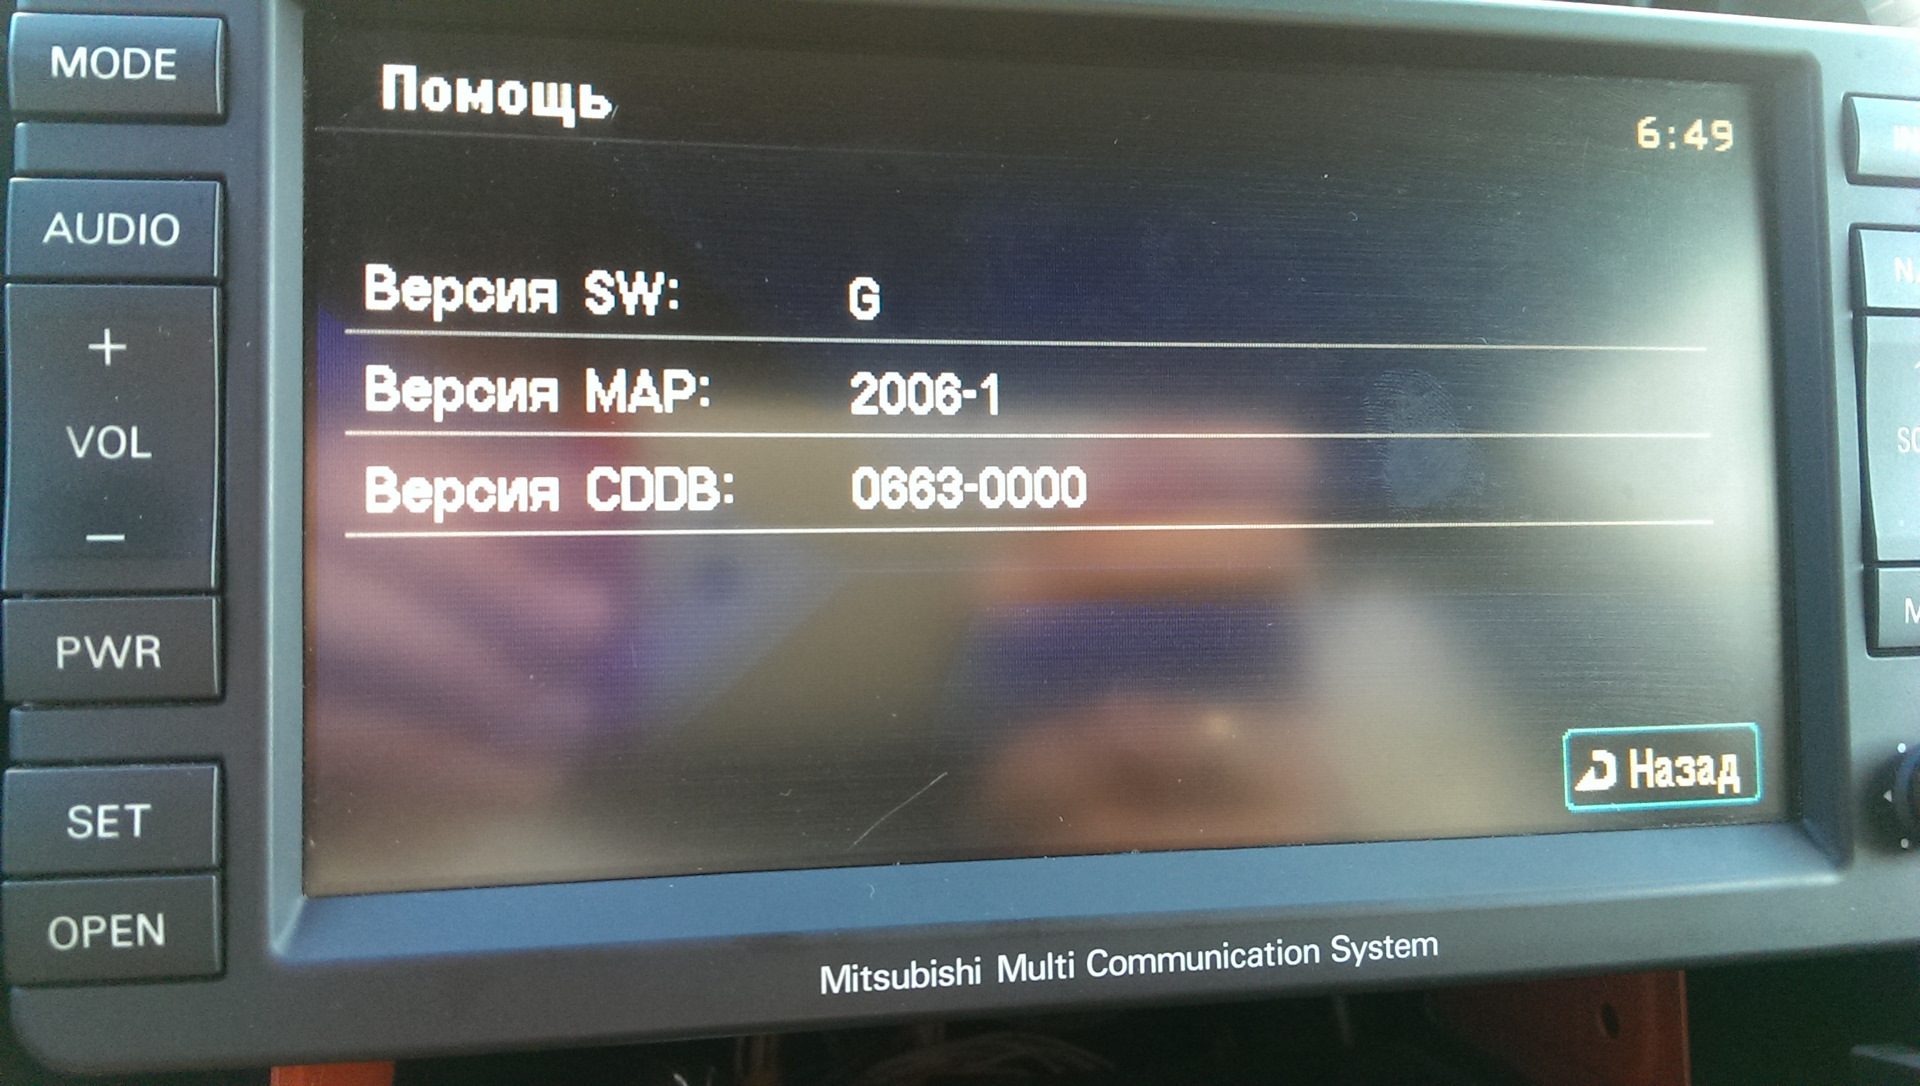 Обновление базы MMCS CDDB (Gracenote) и русские теги магнитоле